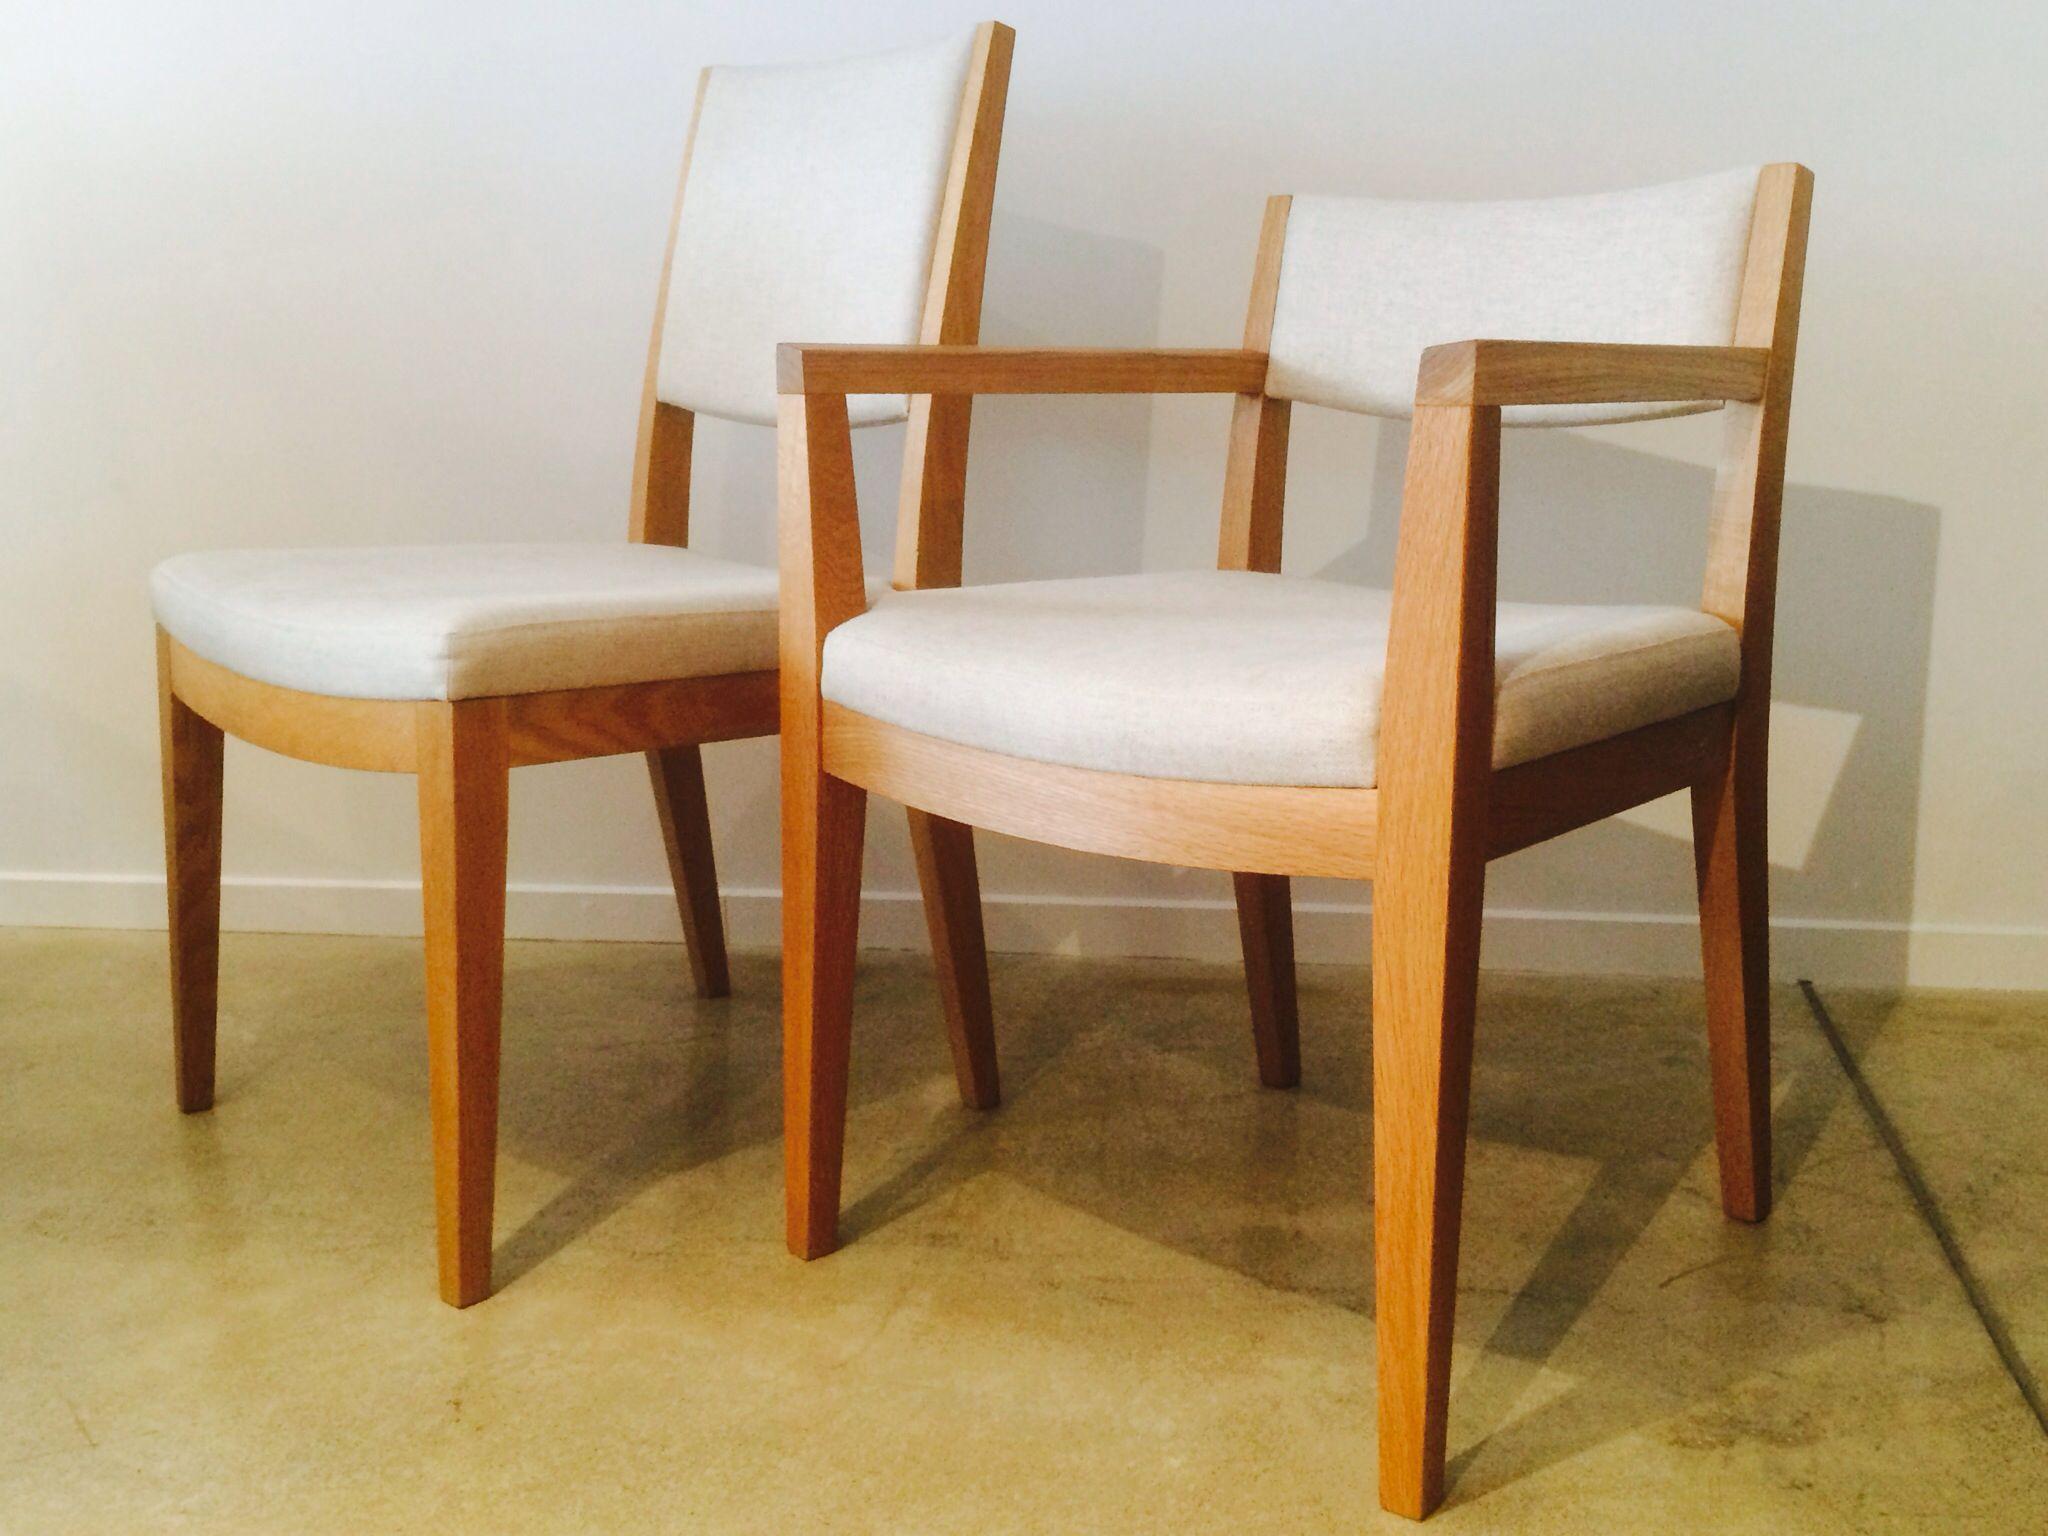 Salon Chairs Chair, Salon chairs, Dining chairs